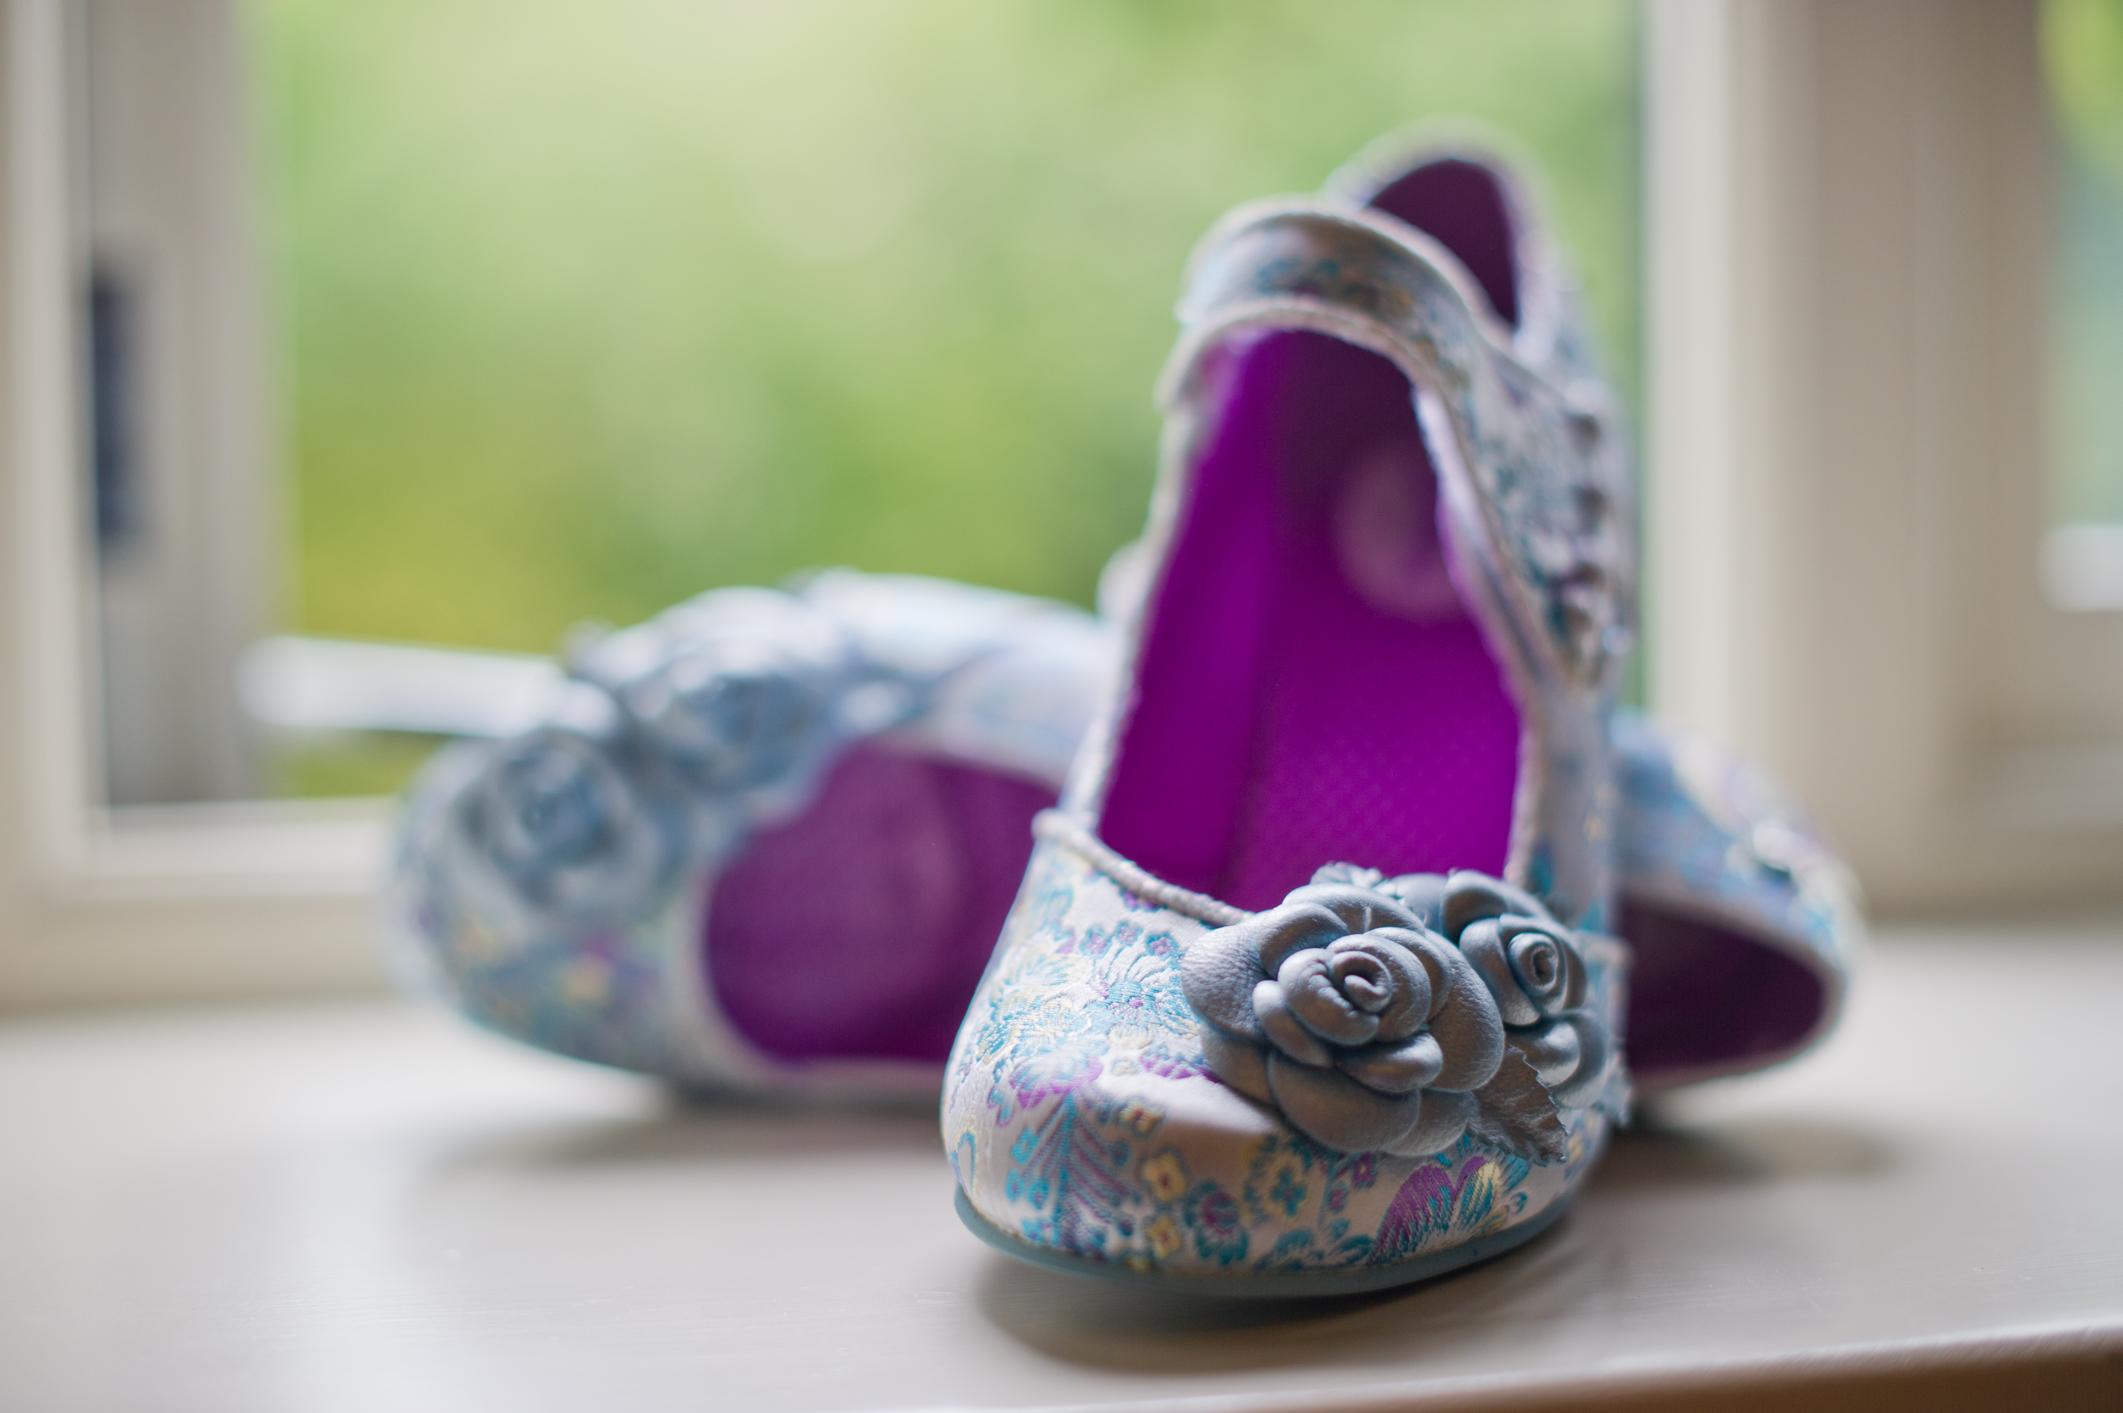 Katy's Wedding Shoes shot during the pre wedding shoot.